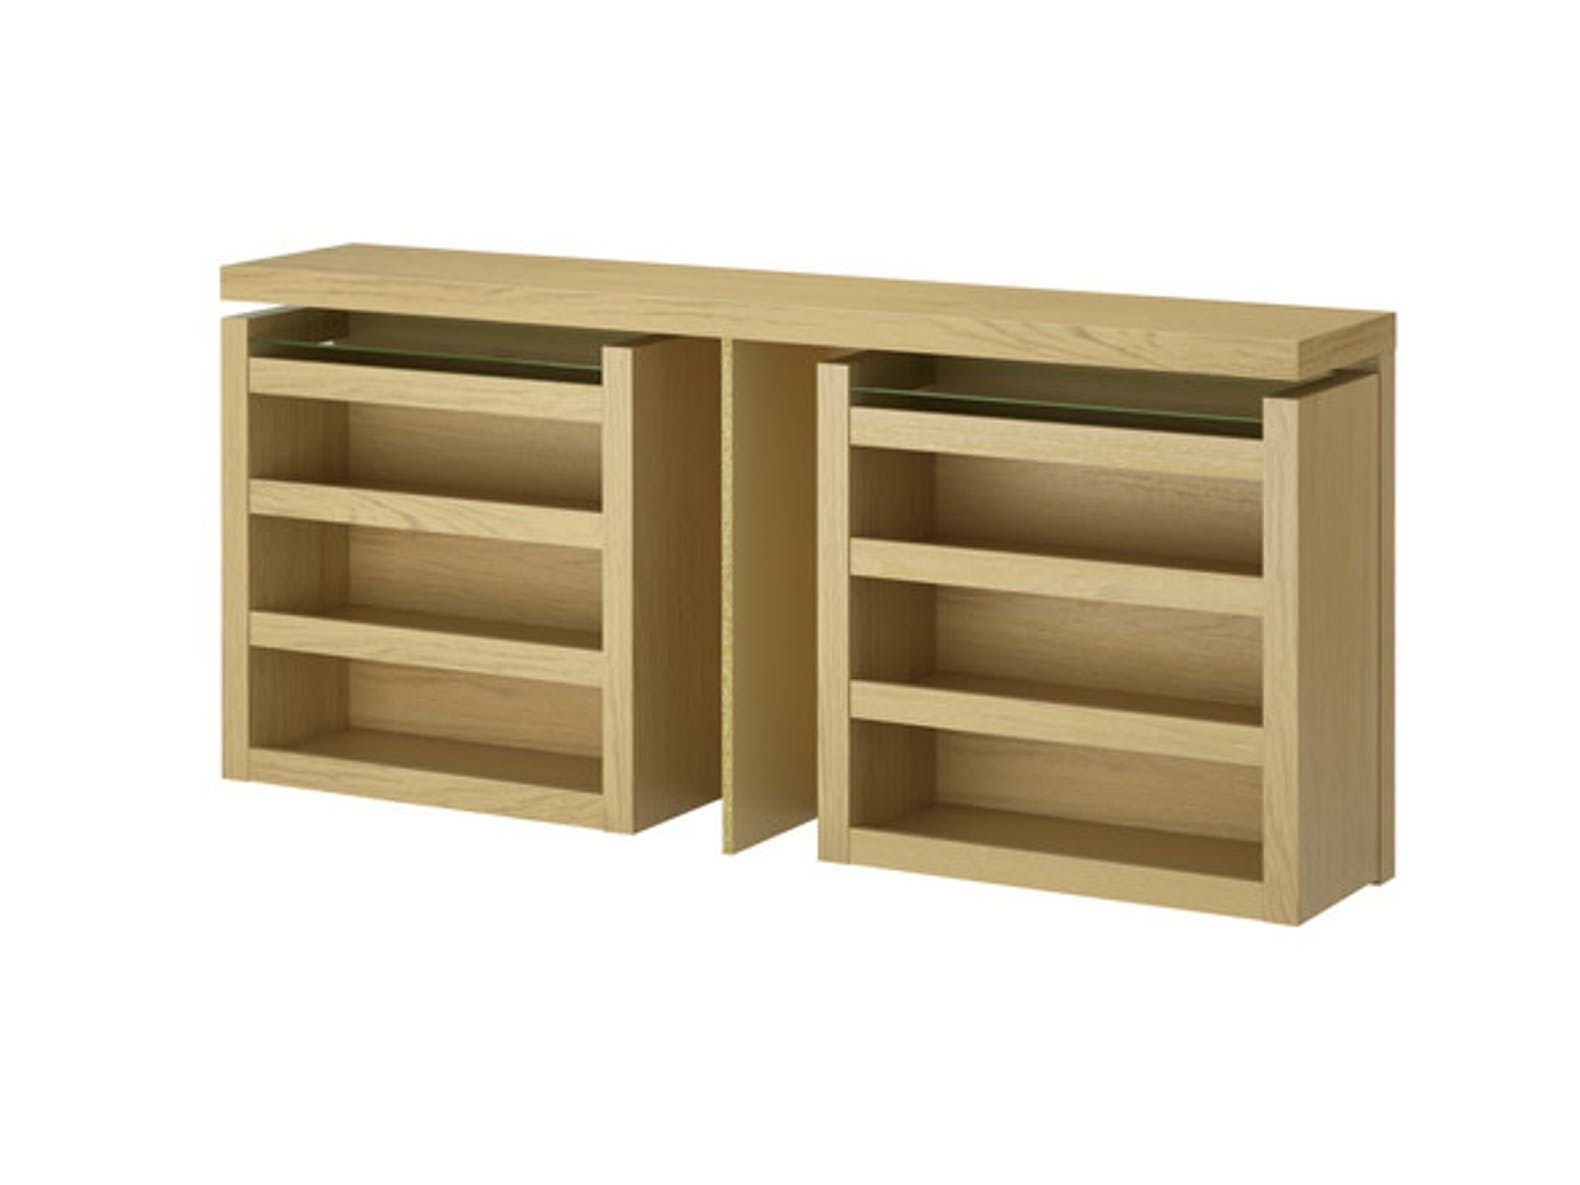 Tete De Lit Avec Rangement Ikea Headboard Bed Shelves Ikea Malm